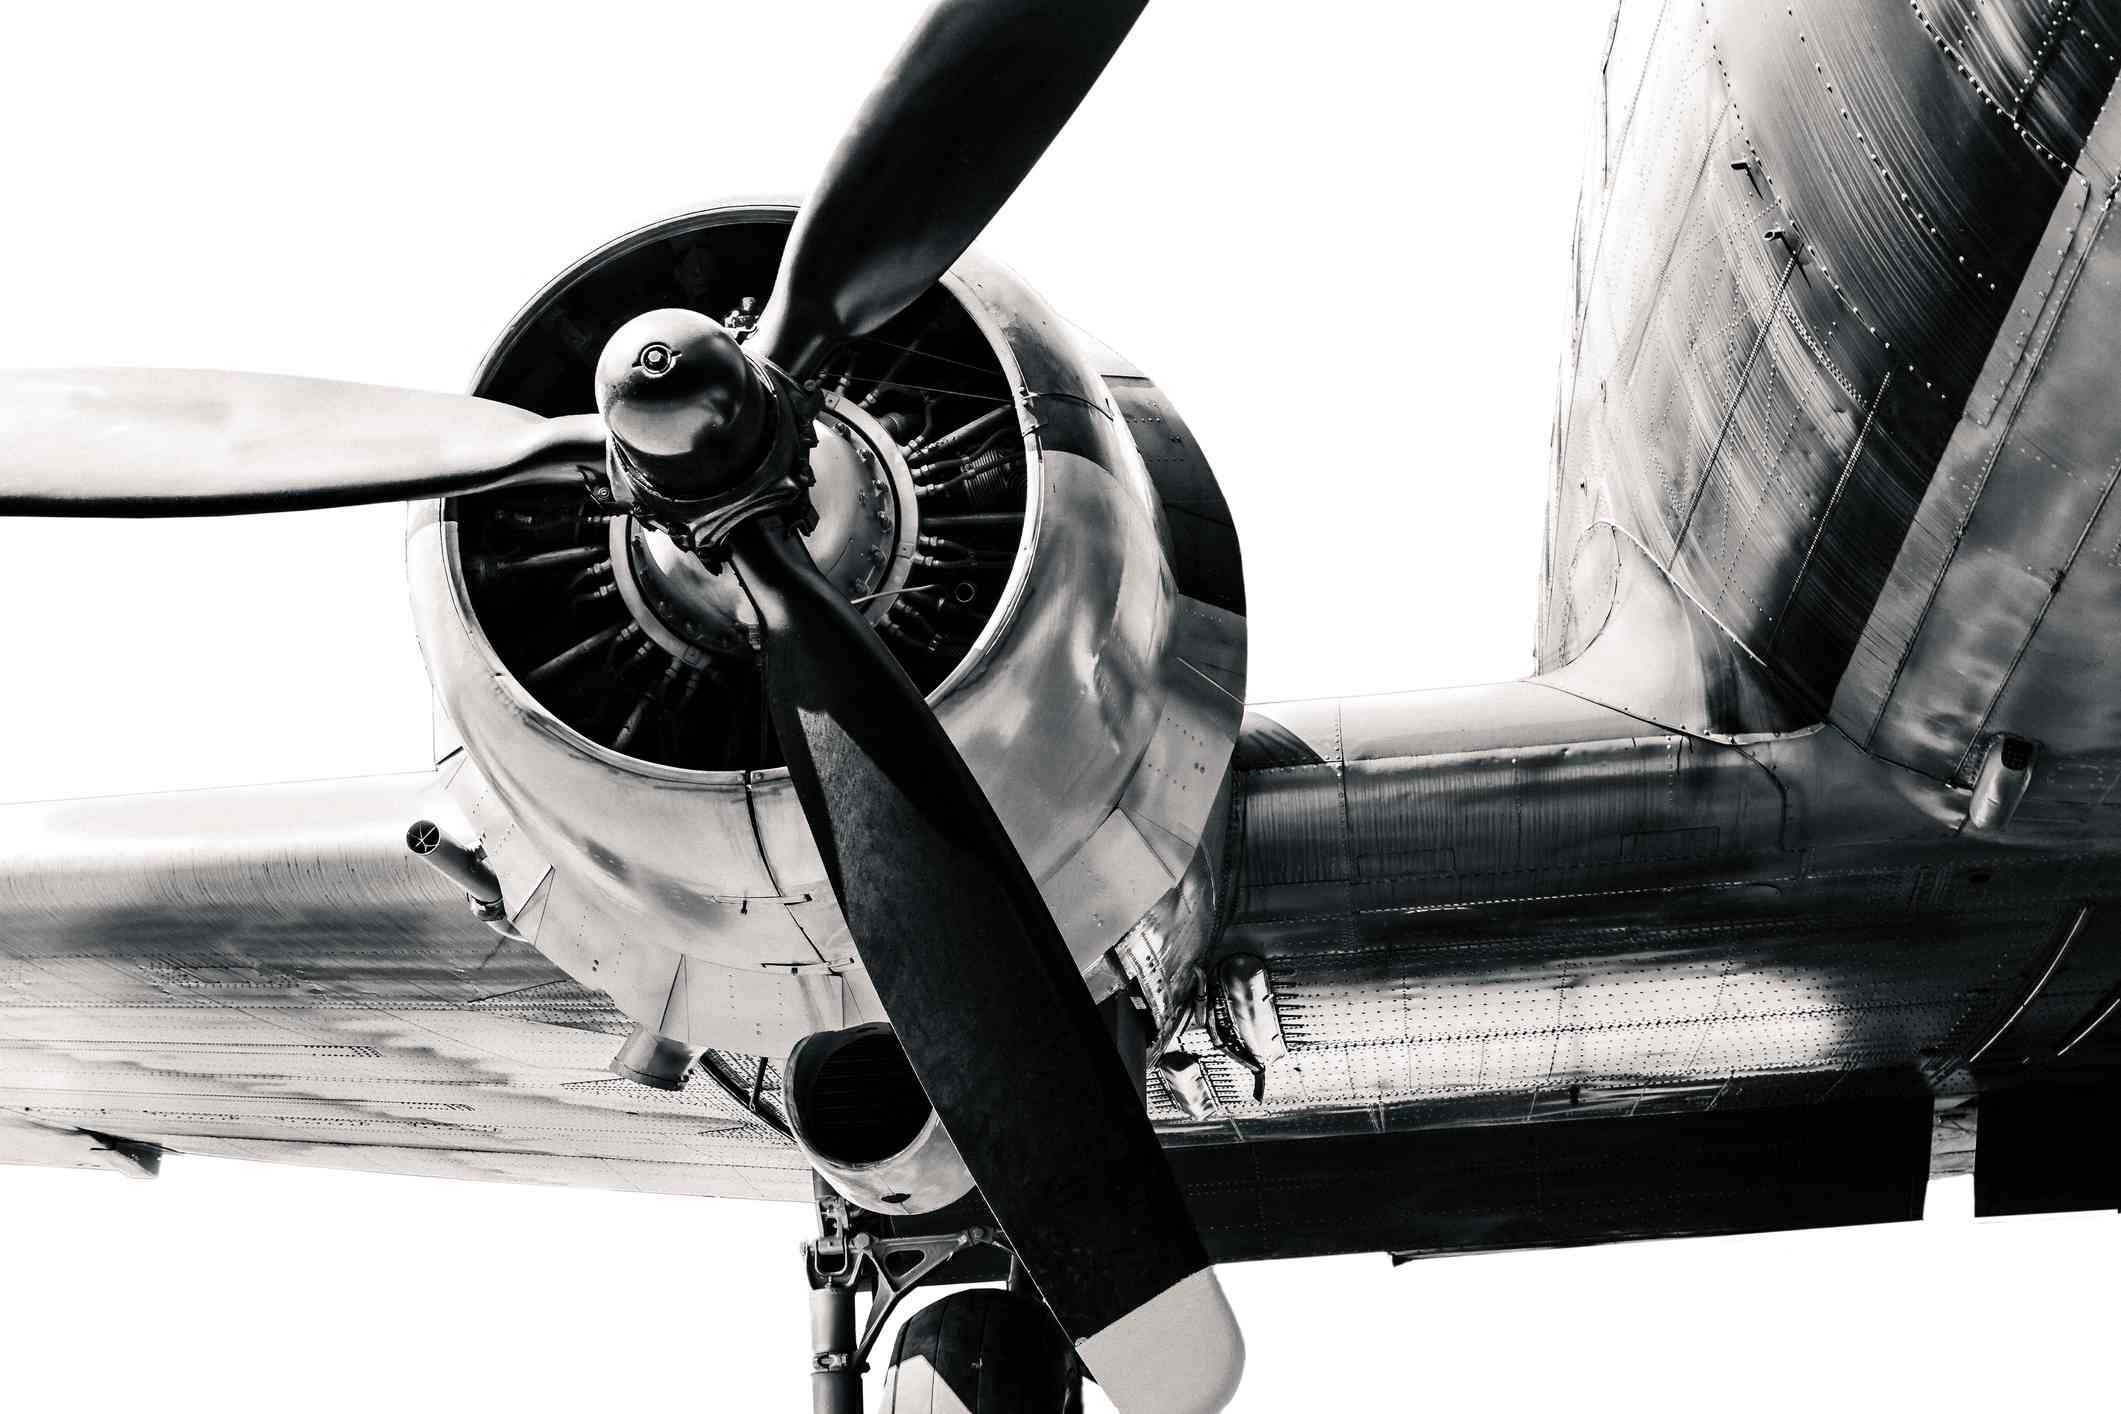 World War II airplane